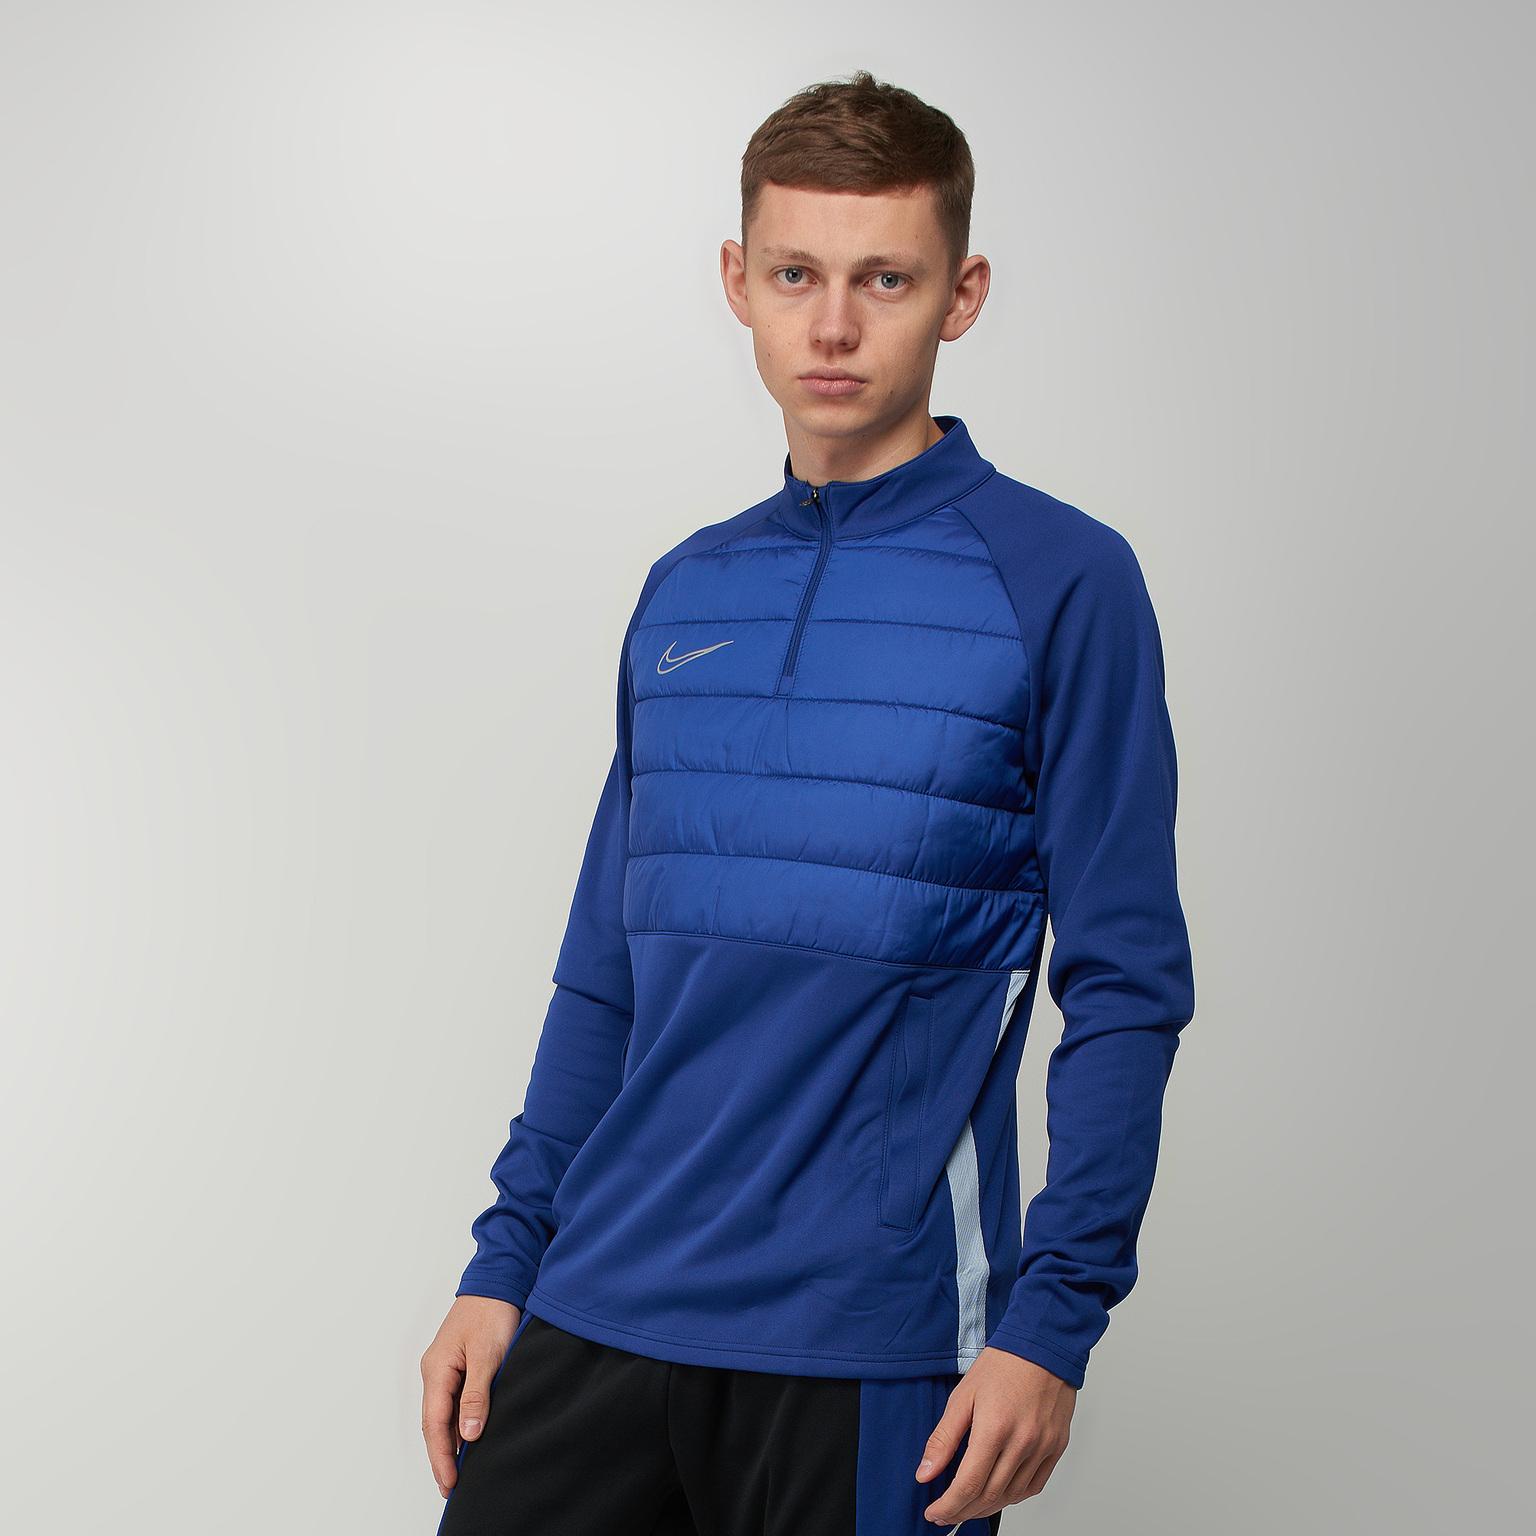 Фото - Свитер тренировочный Nike Dry Pad Dril Top BQ7473-455 свитер тренировочный nike dry academy18 dril top ls 893624 451